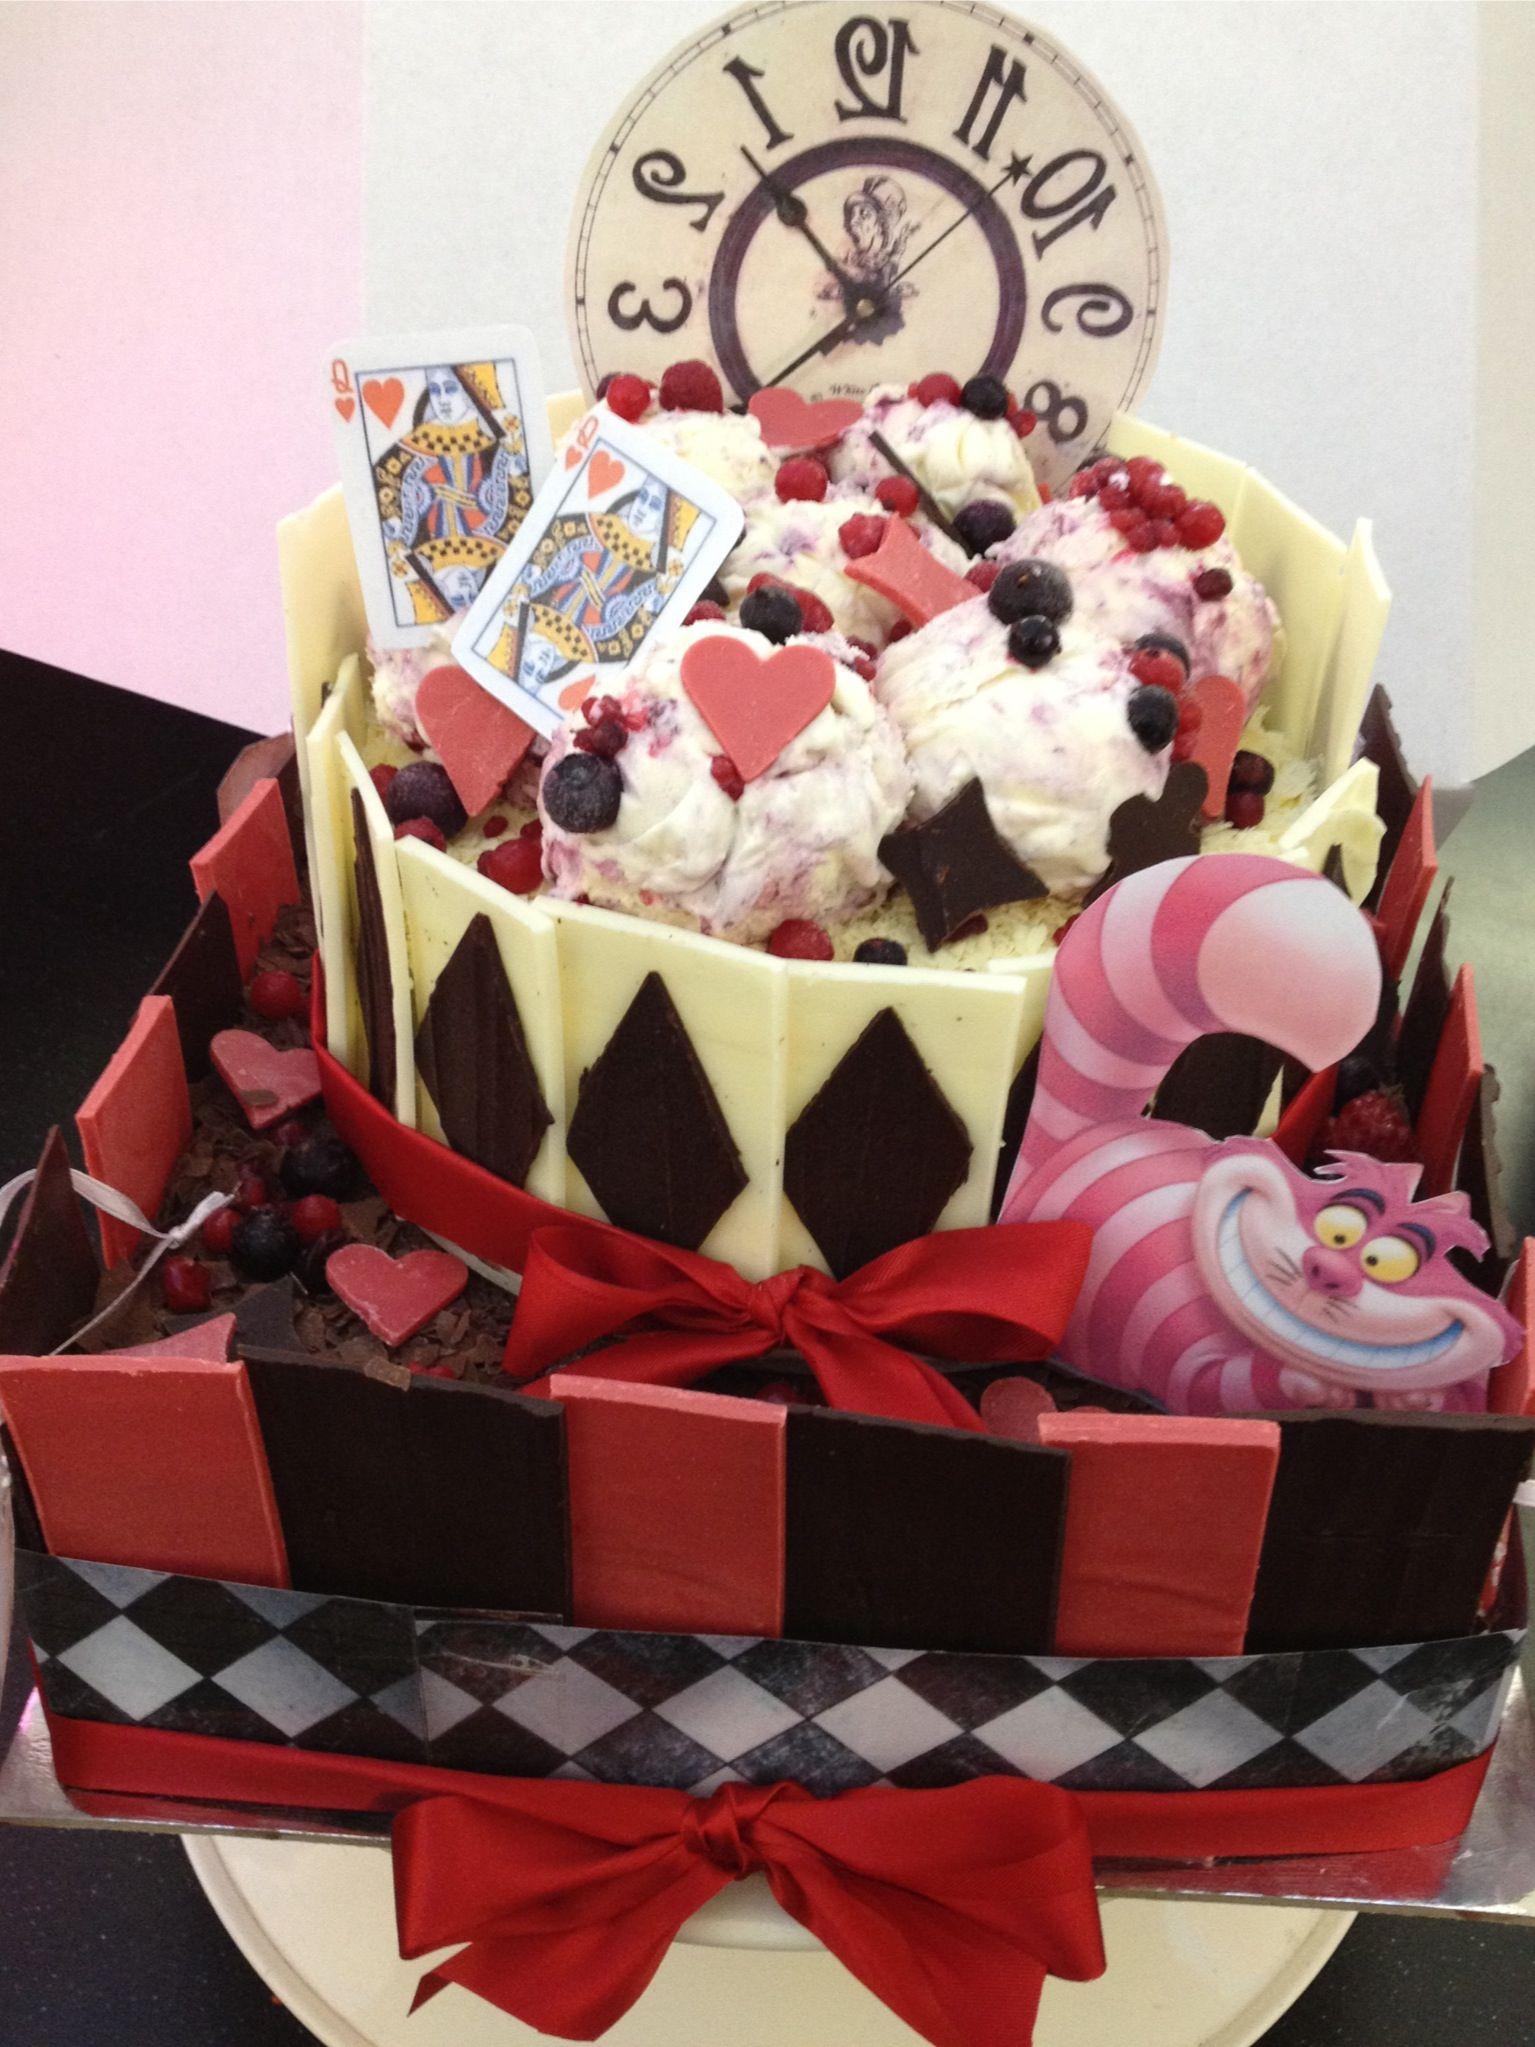 Alice in wonderland ice cream cake ice cream cake cake